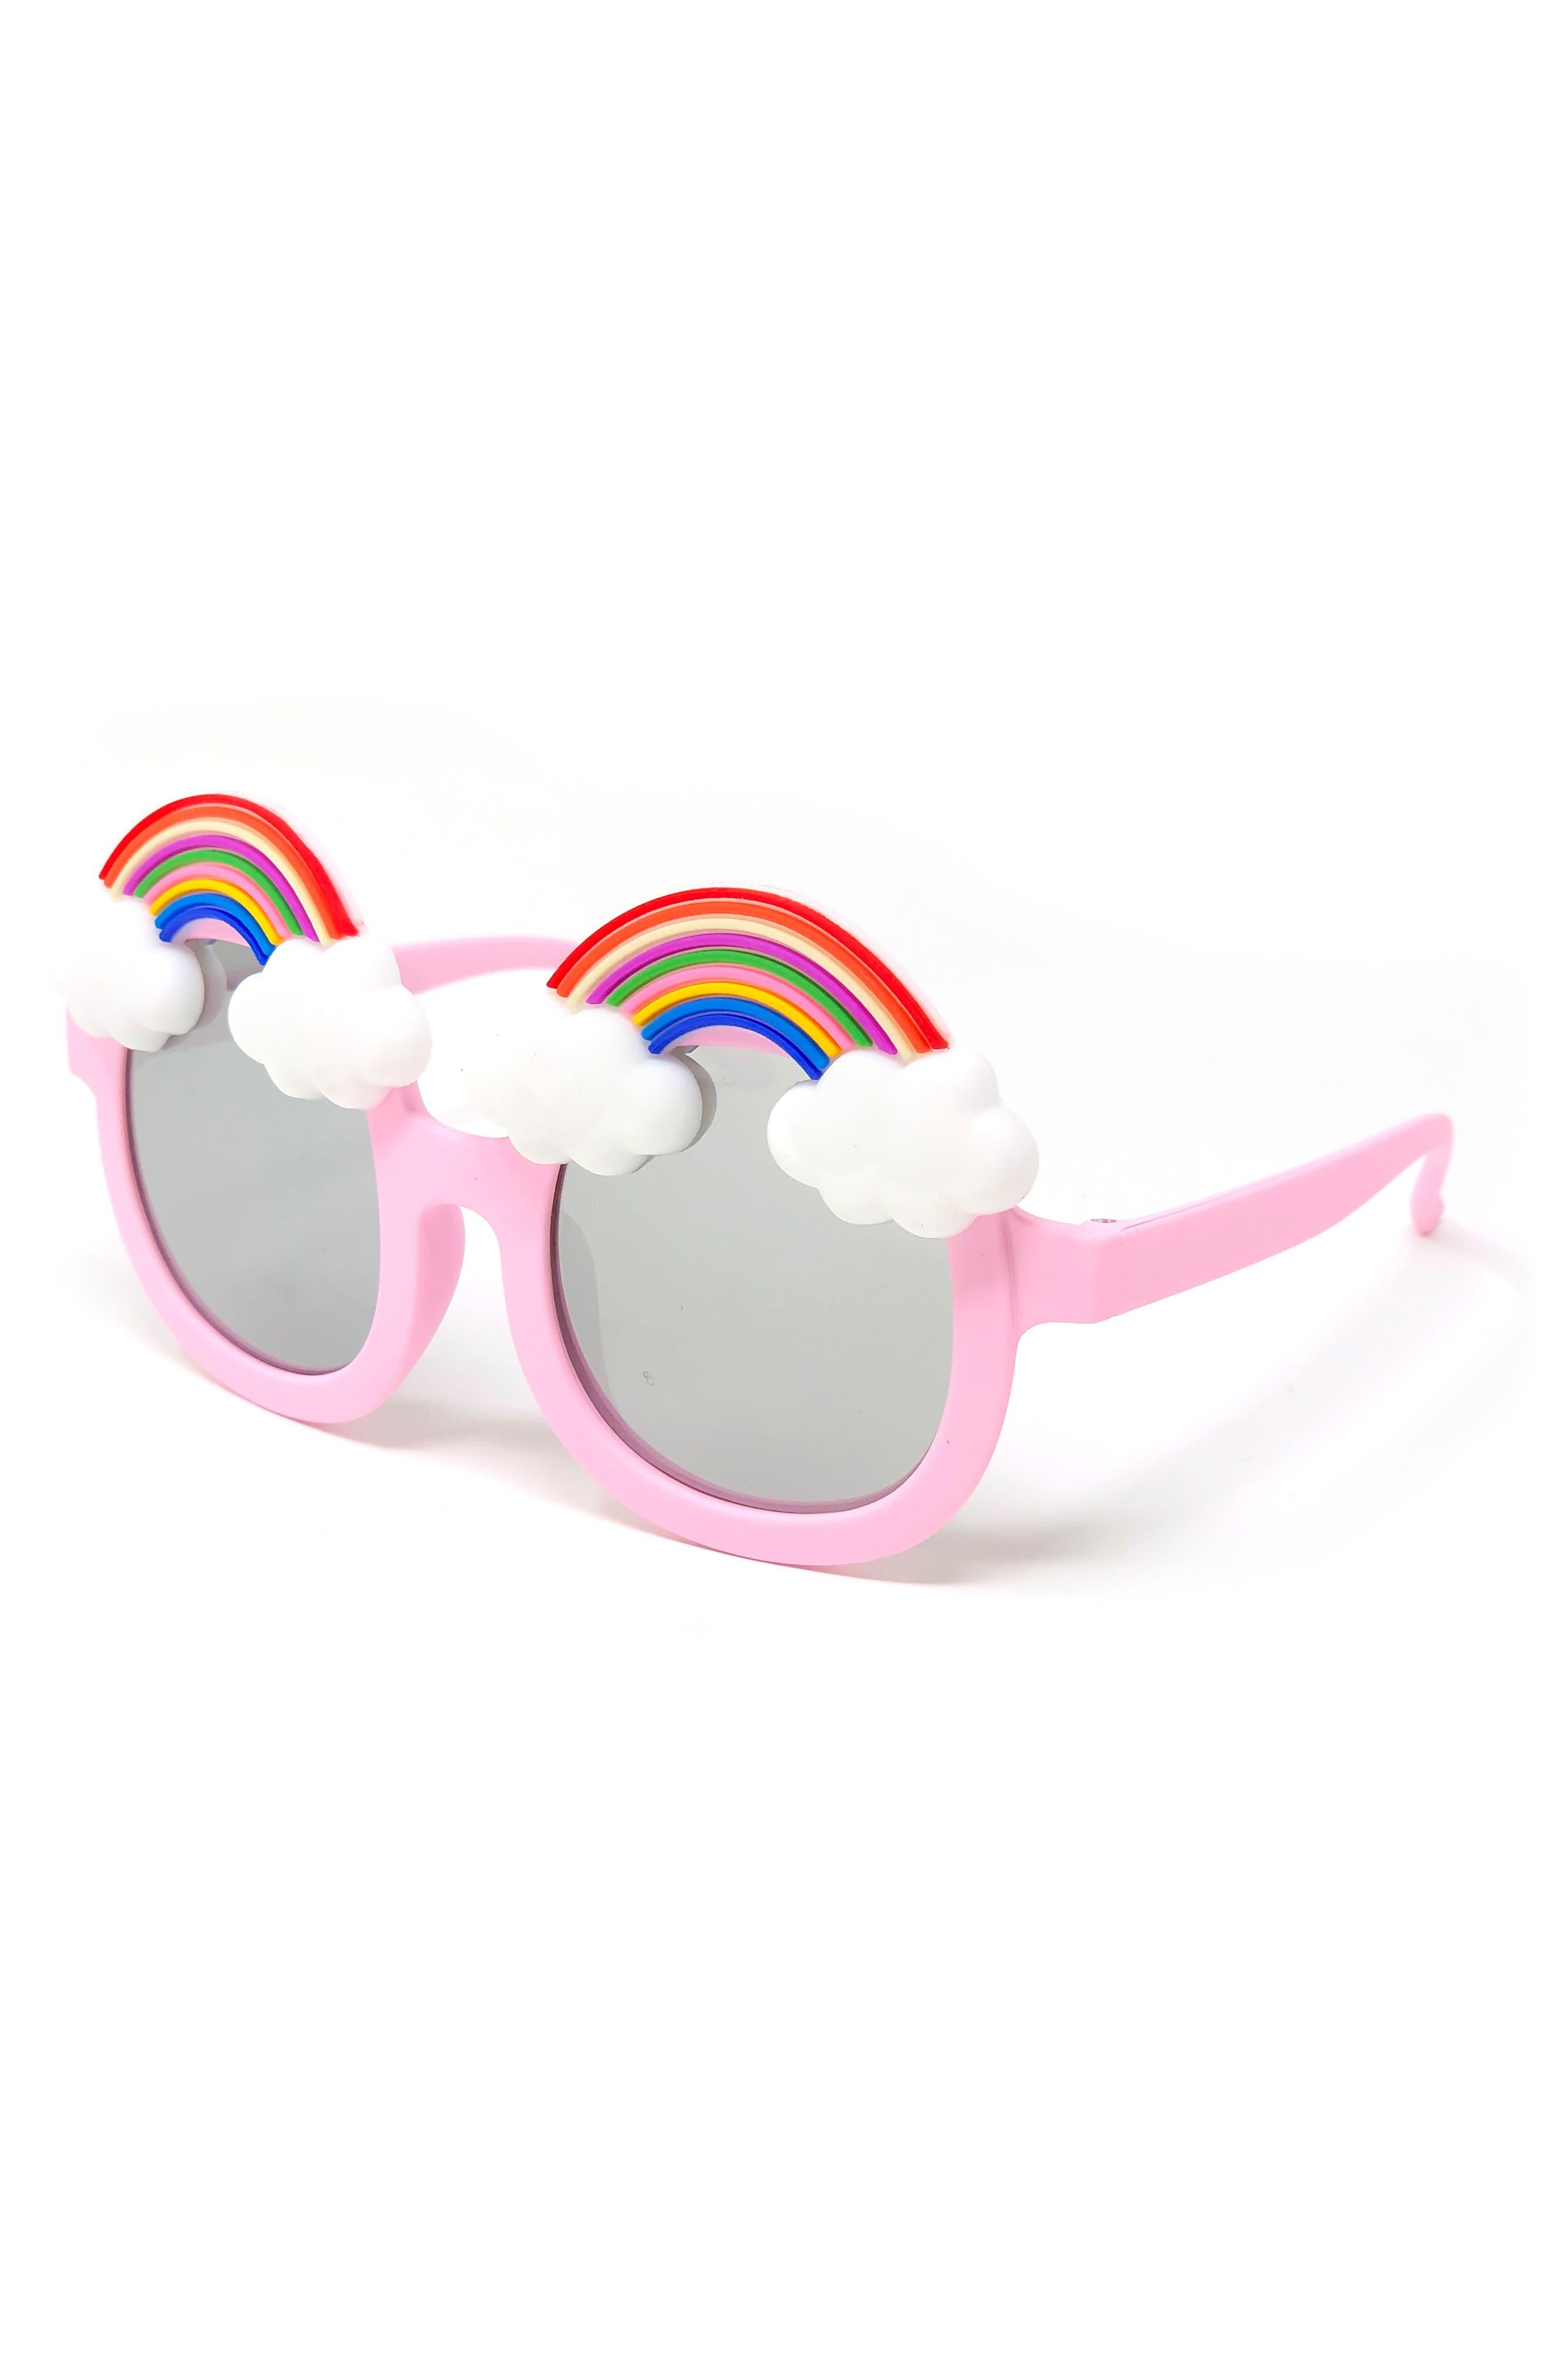 Rainbow Mirrored Sunglasses,                             Main thumbnail 1, color,                             PINK